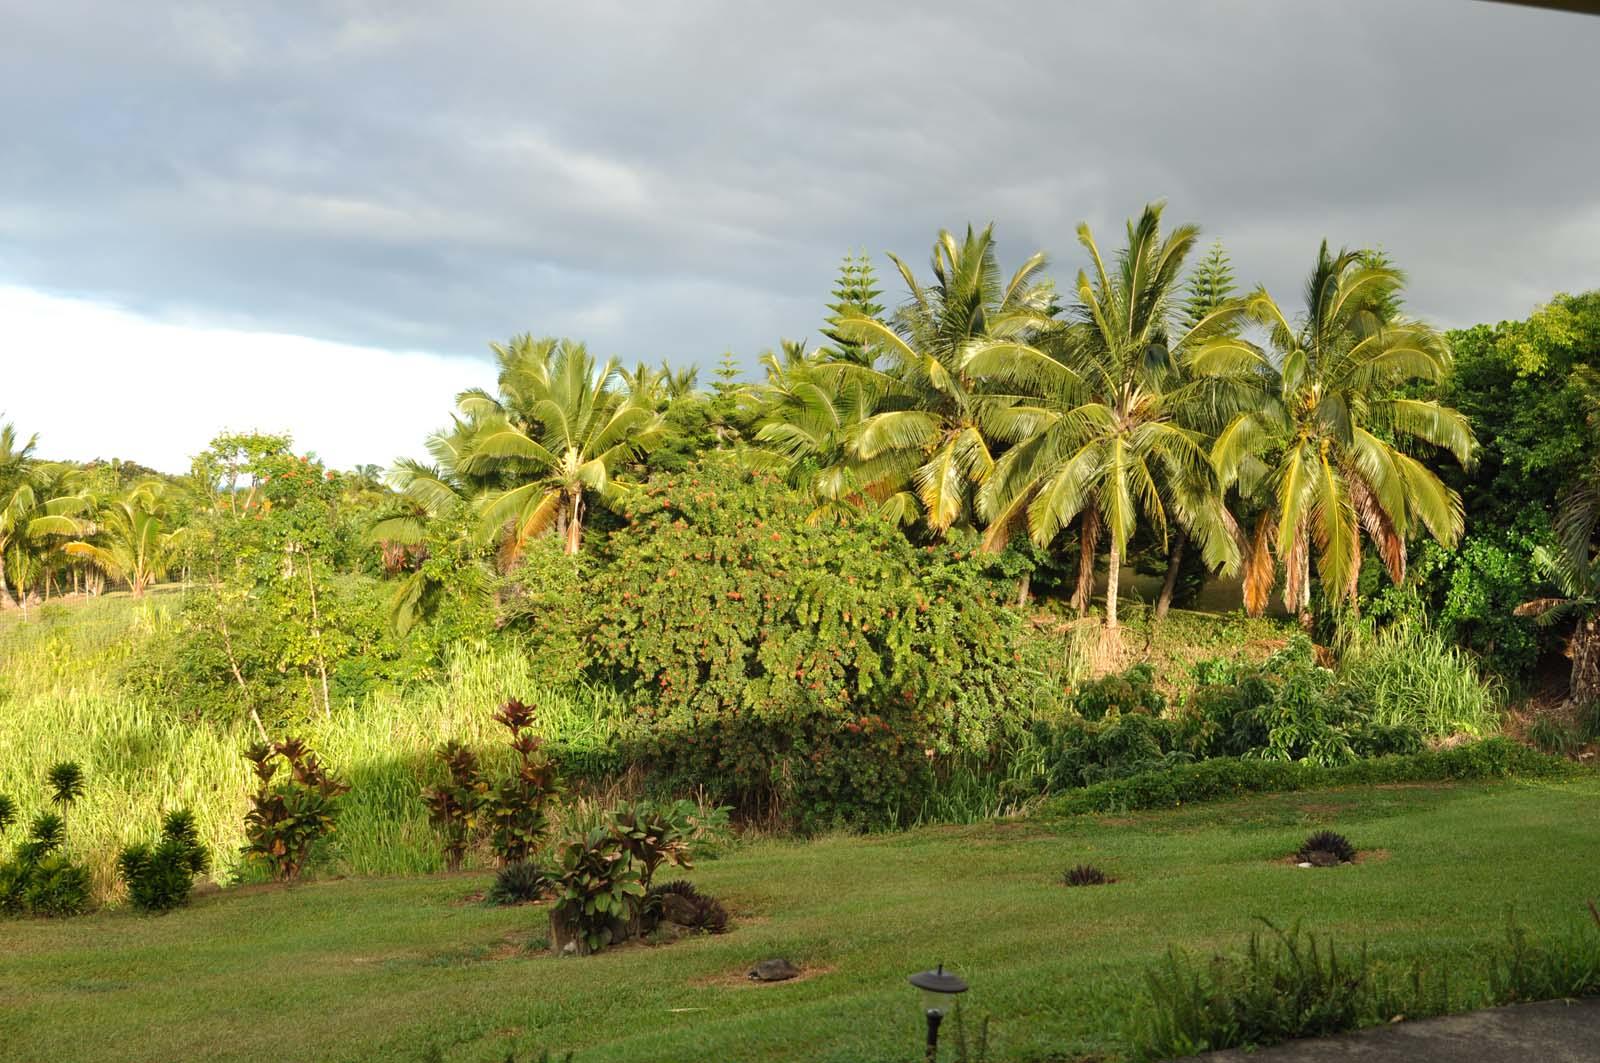 049_maui_hawaii_island